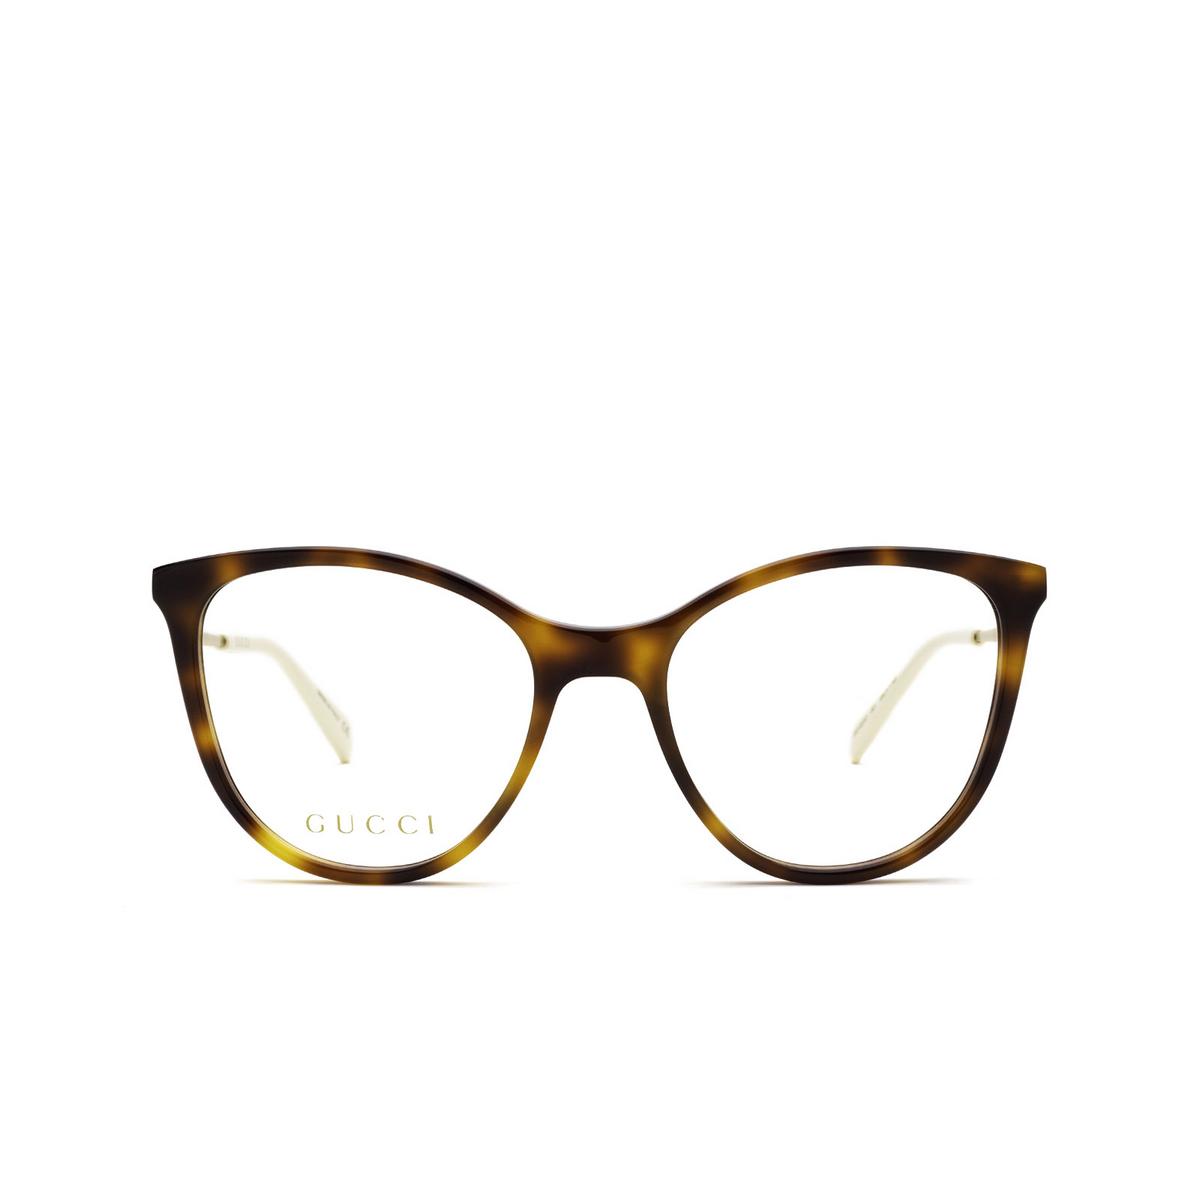 Gucci® Cat-eye Eyeglasses: GG1007O color Havana 004 - front view.